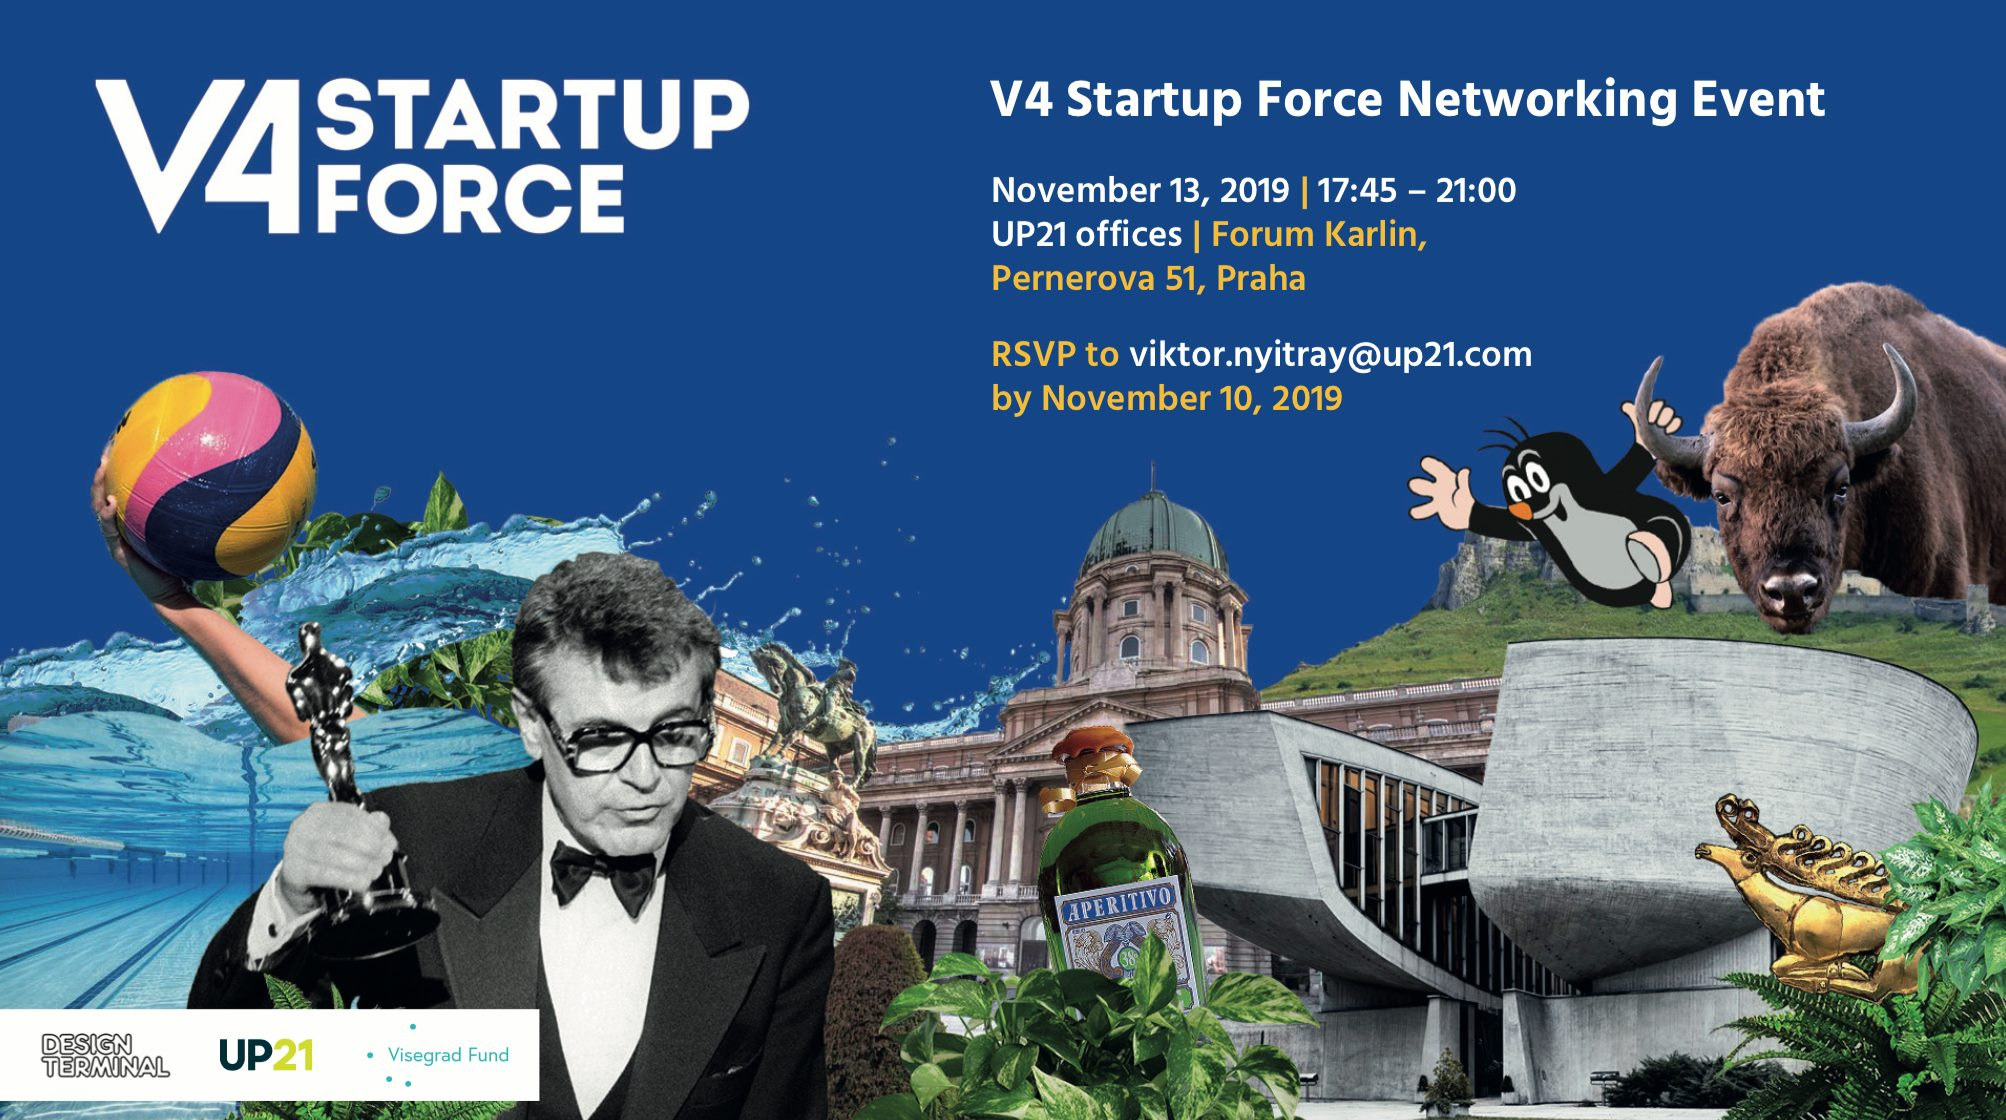 V4 Startup Force Networking Event